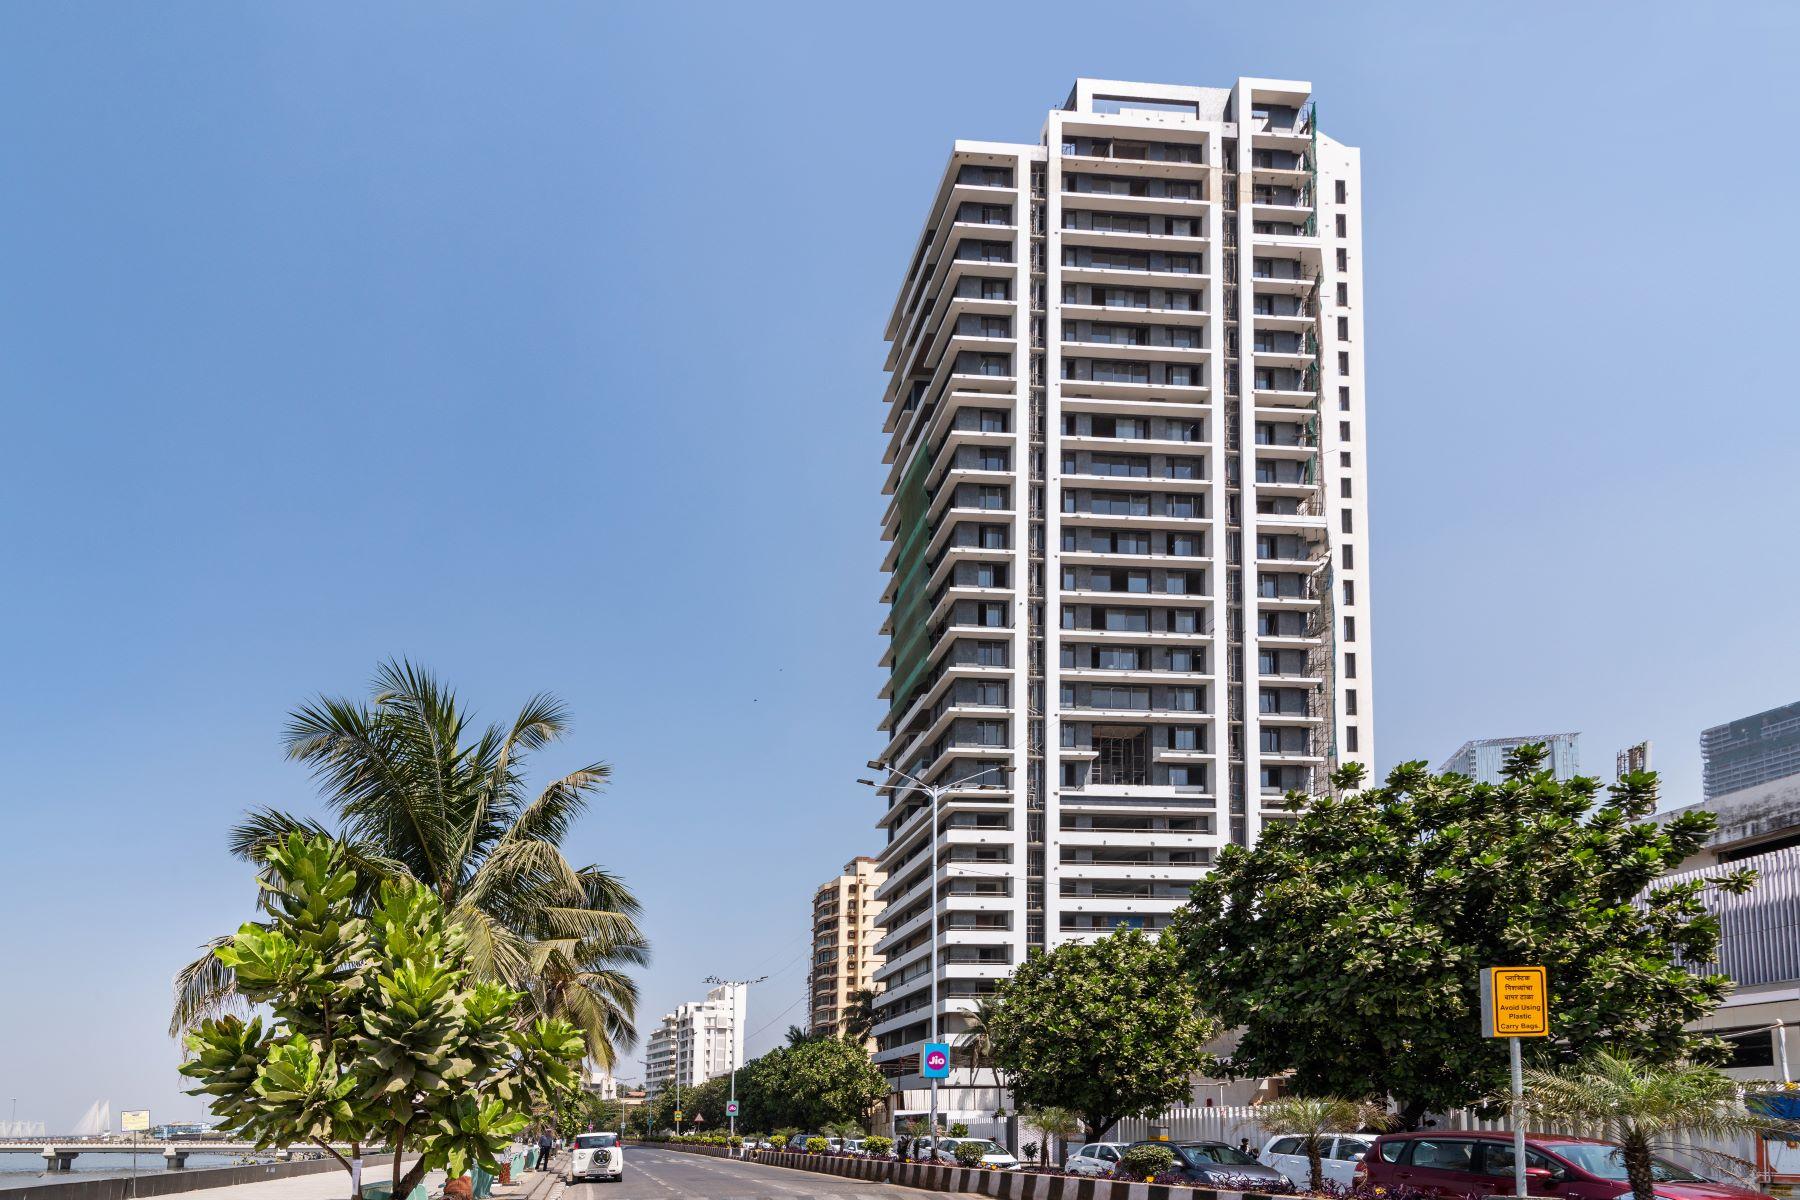 Apartments 为 销售 在 Panoramic Sea Facing Apartment, Worli Sea Face 孟买, 马哈拉托特拉邦 400030 印度